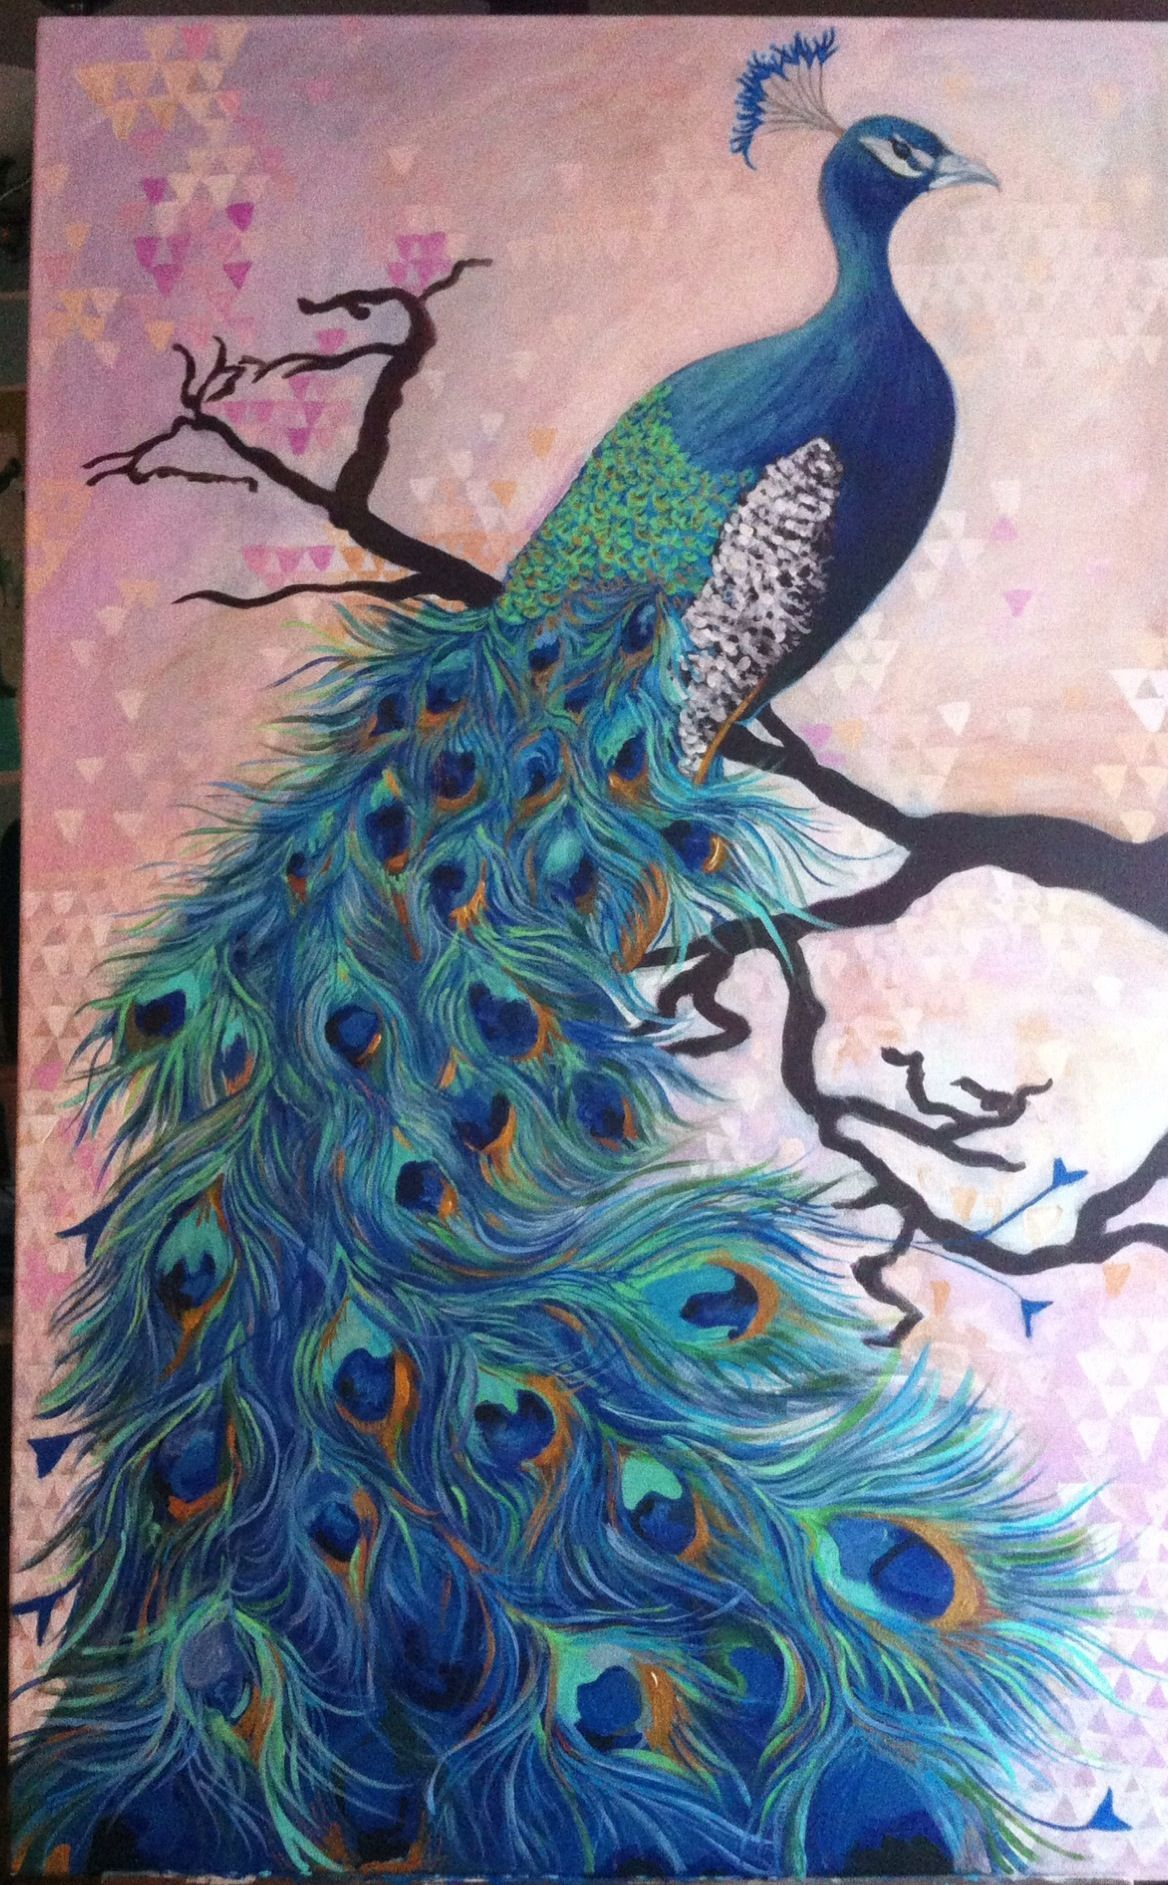 Pin by Vinai Singh on Viju in 2019 | Peacock painting ...